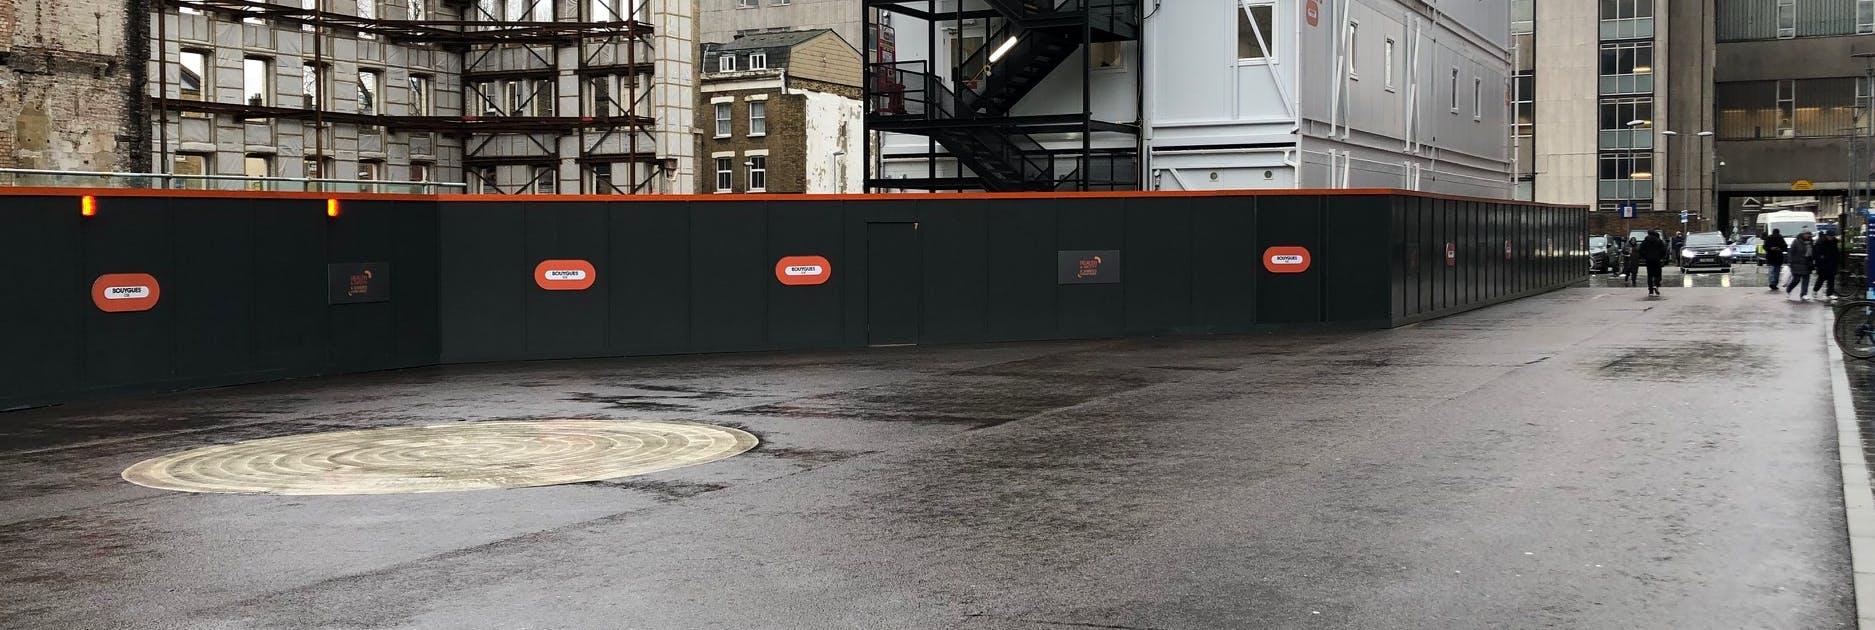 View across London Square